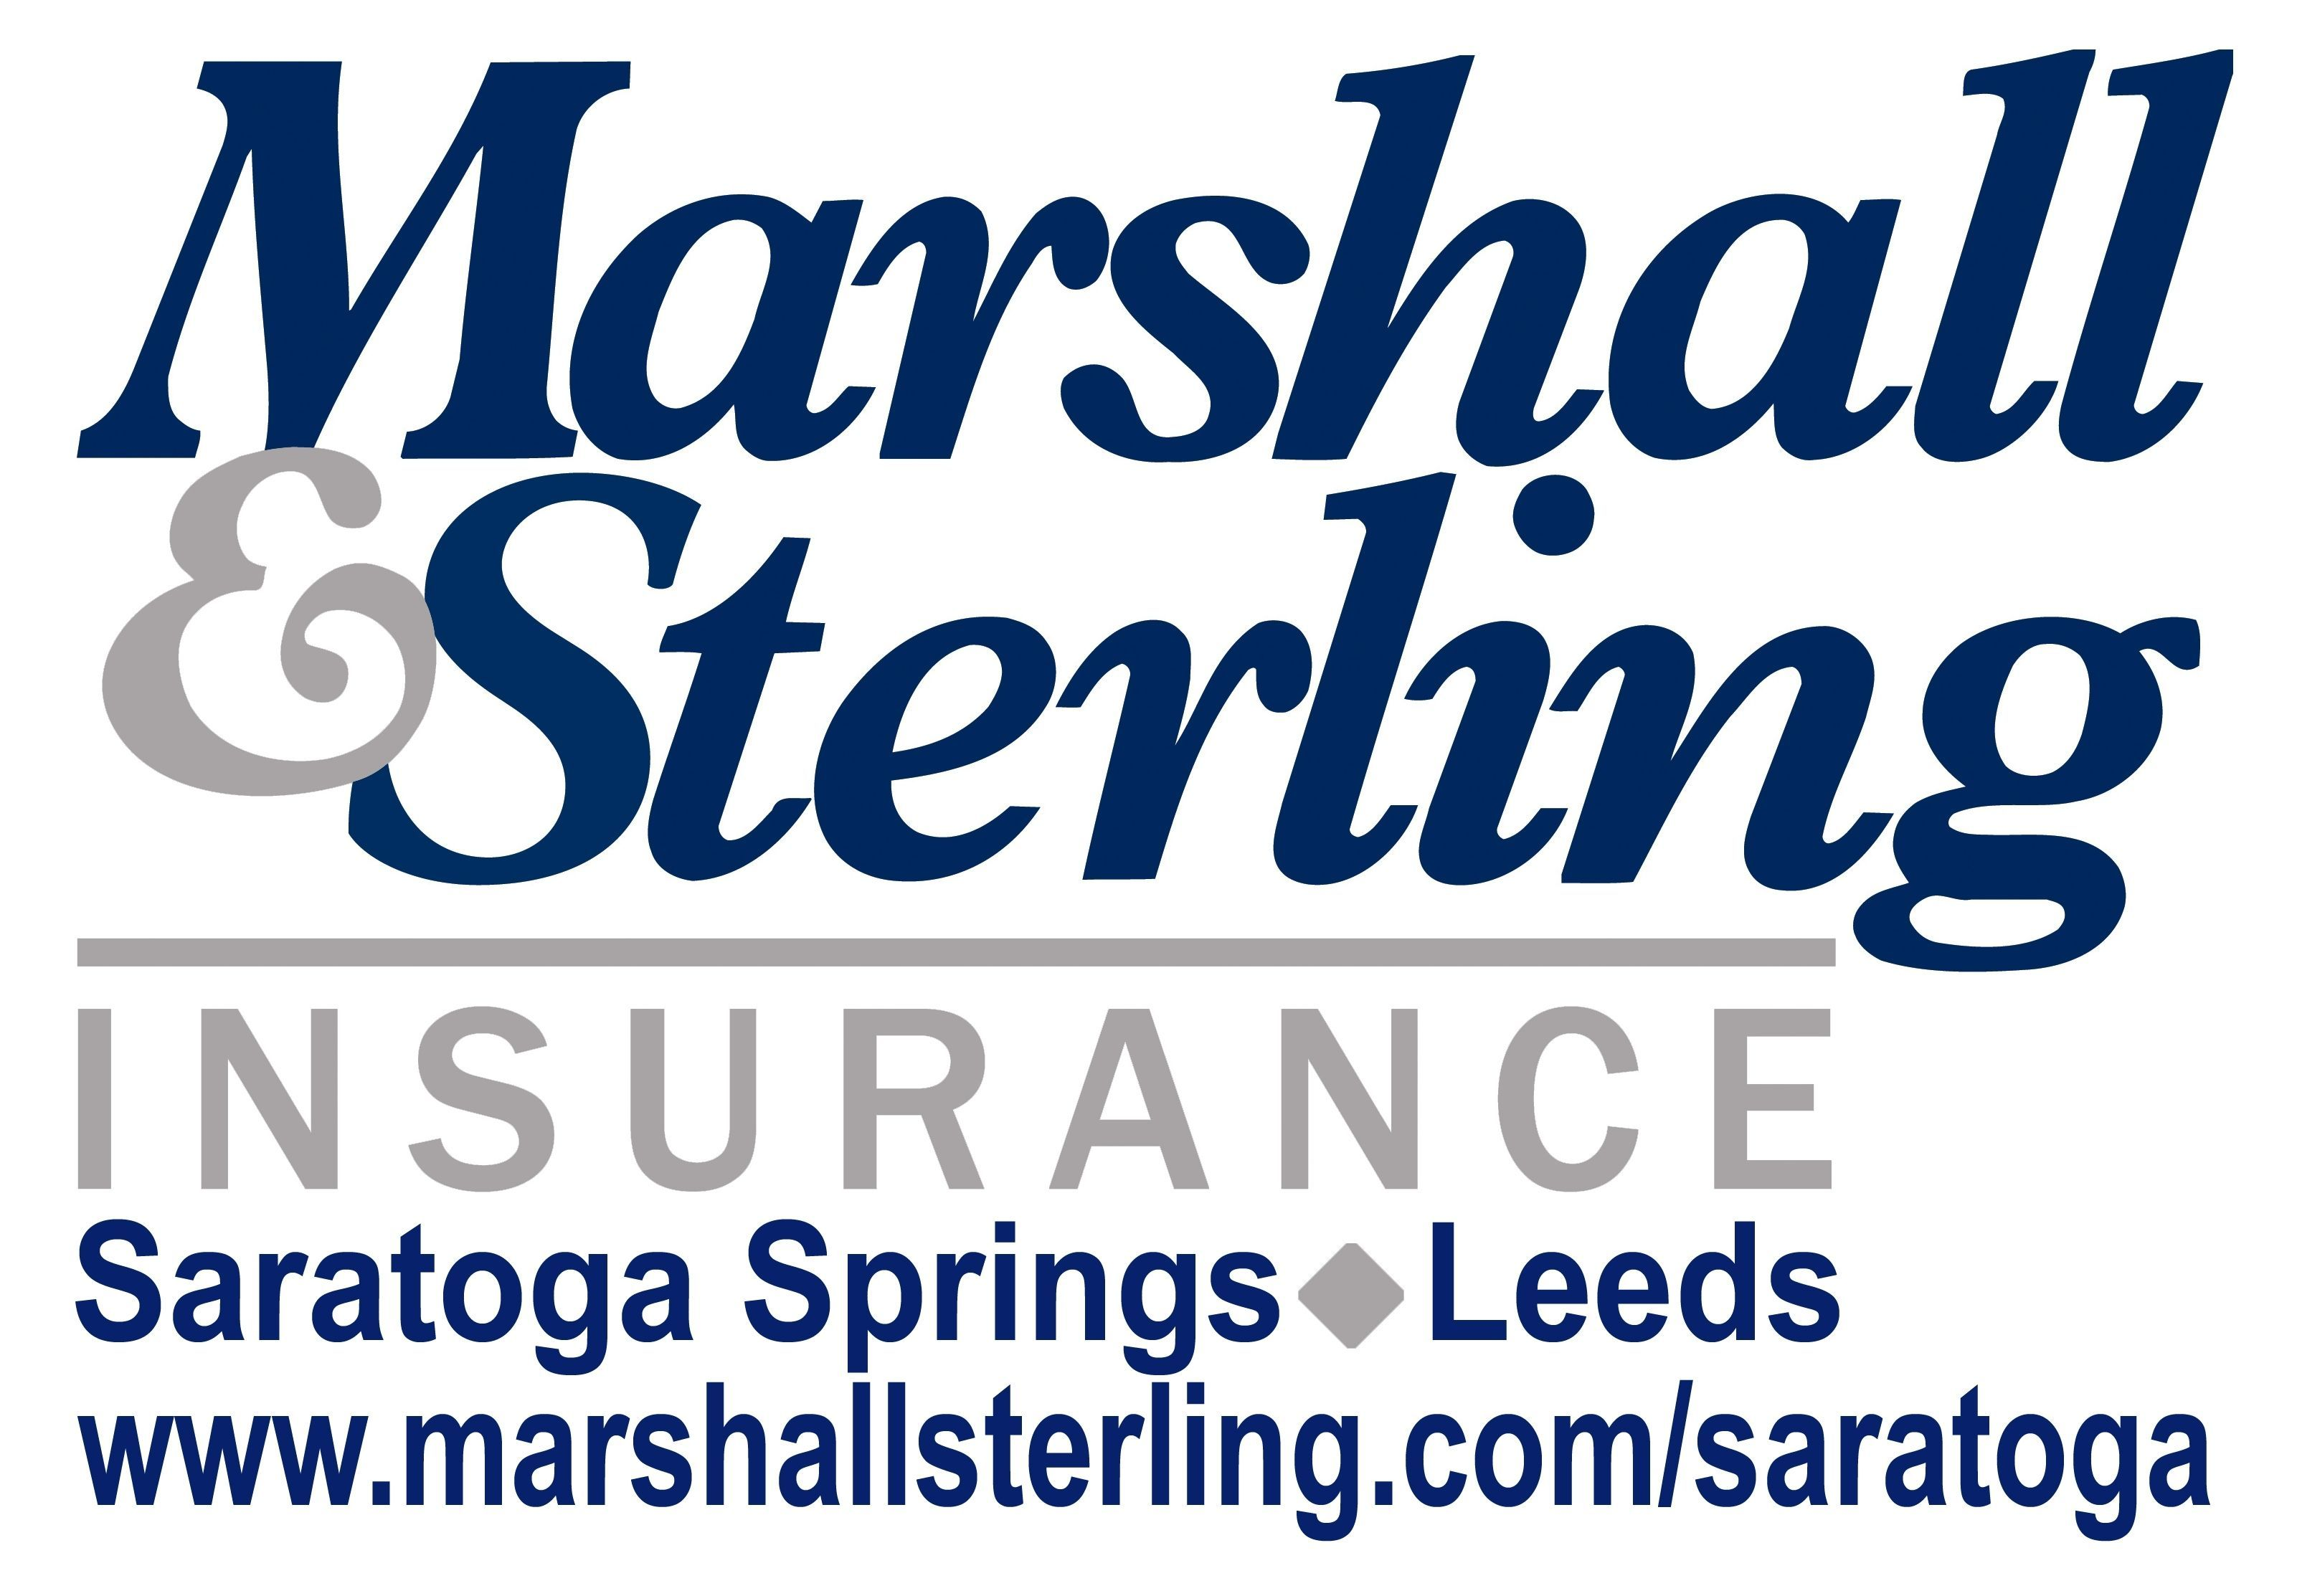 Marshall & Sterling Upstate